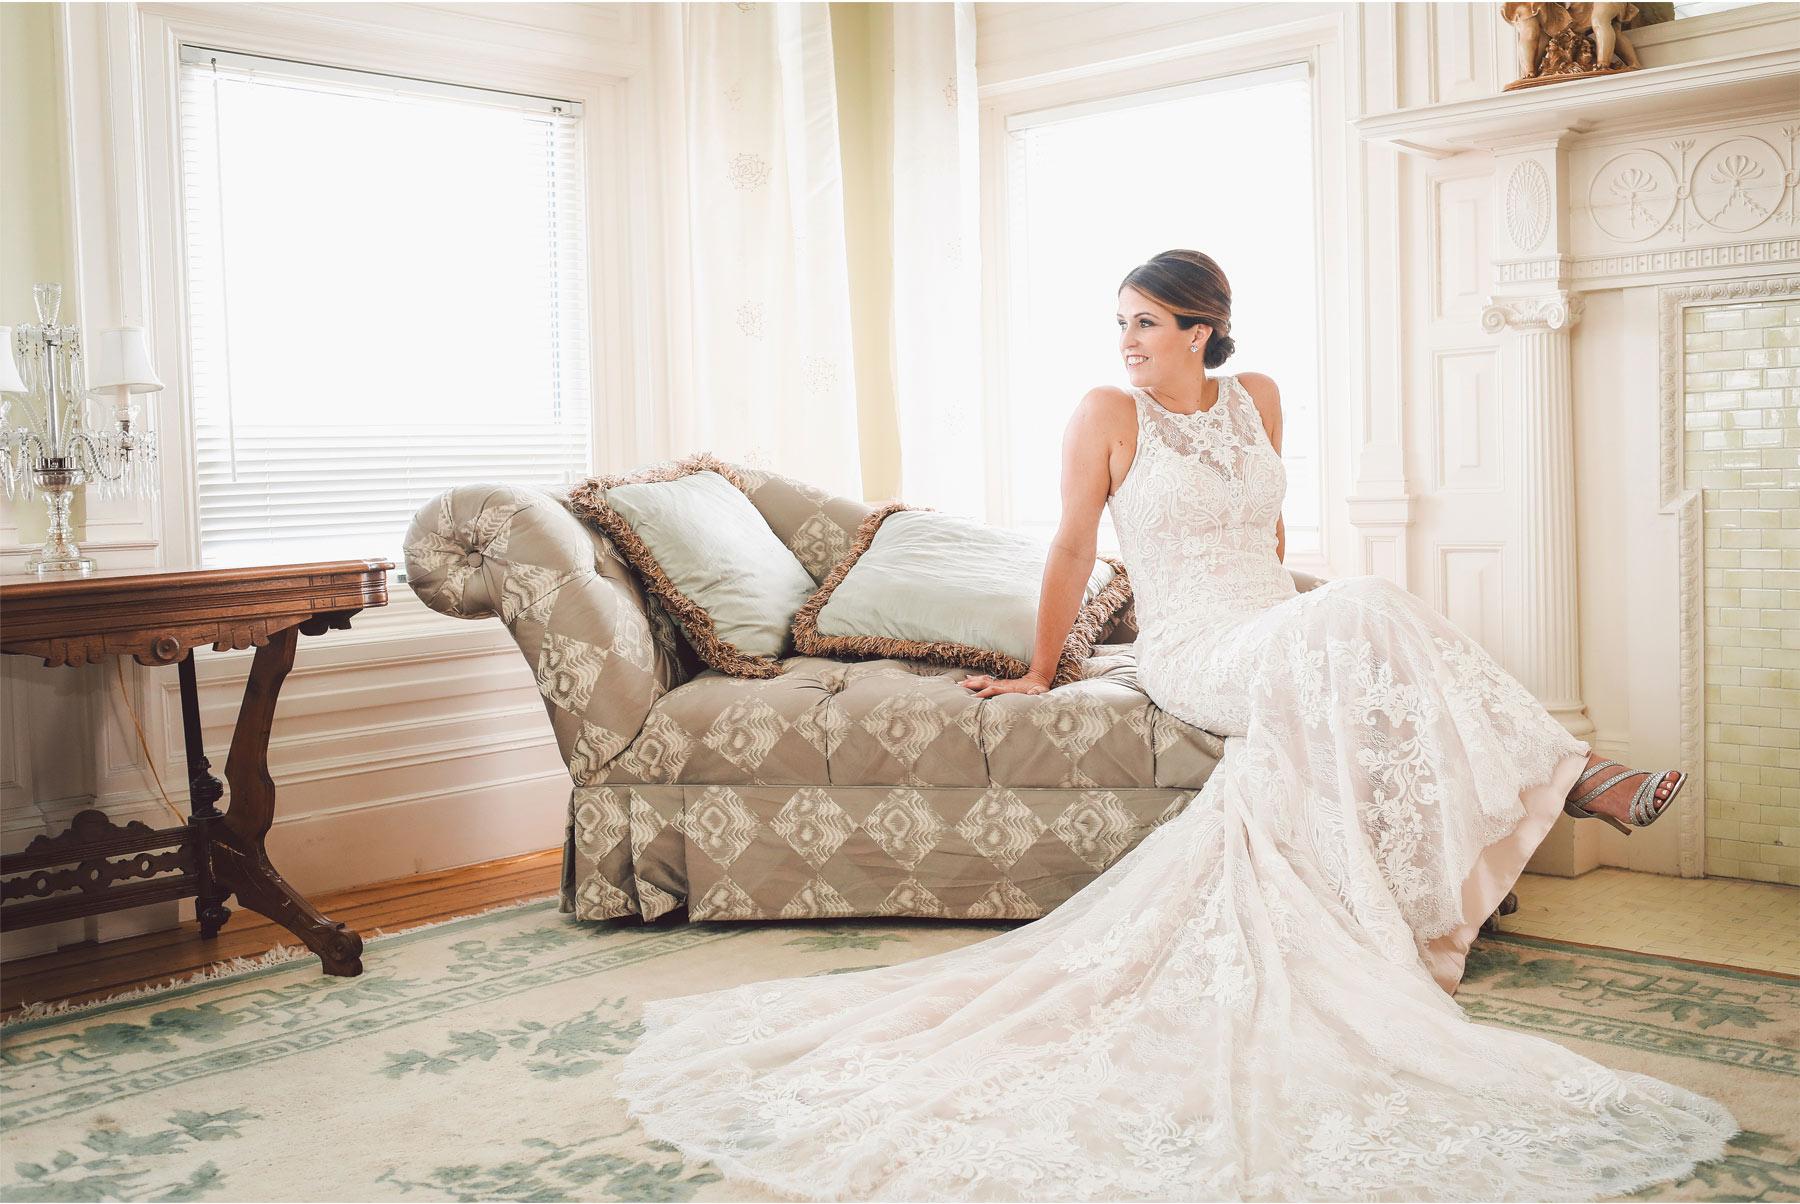 02-Minneapolis-Minnesota-Wedding-Photographer-by-Vick-Photography-Van-Dusen-Mansion-Wedding-Dress-Getting-Ready-Megan-and-Ned.jpg